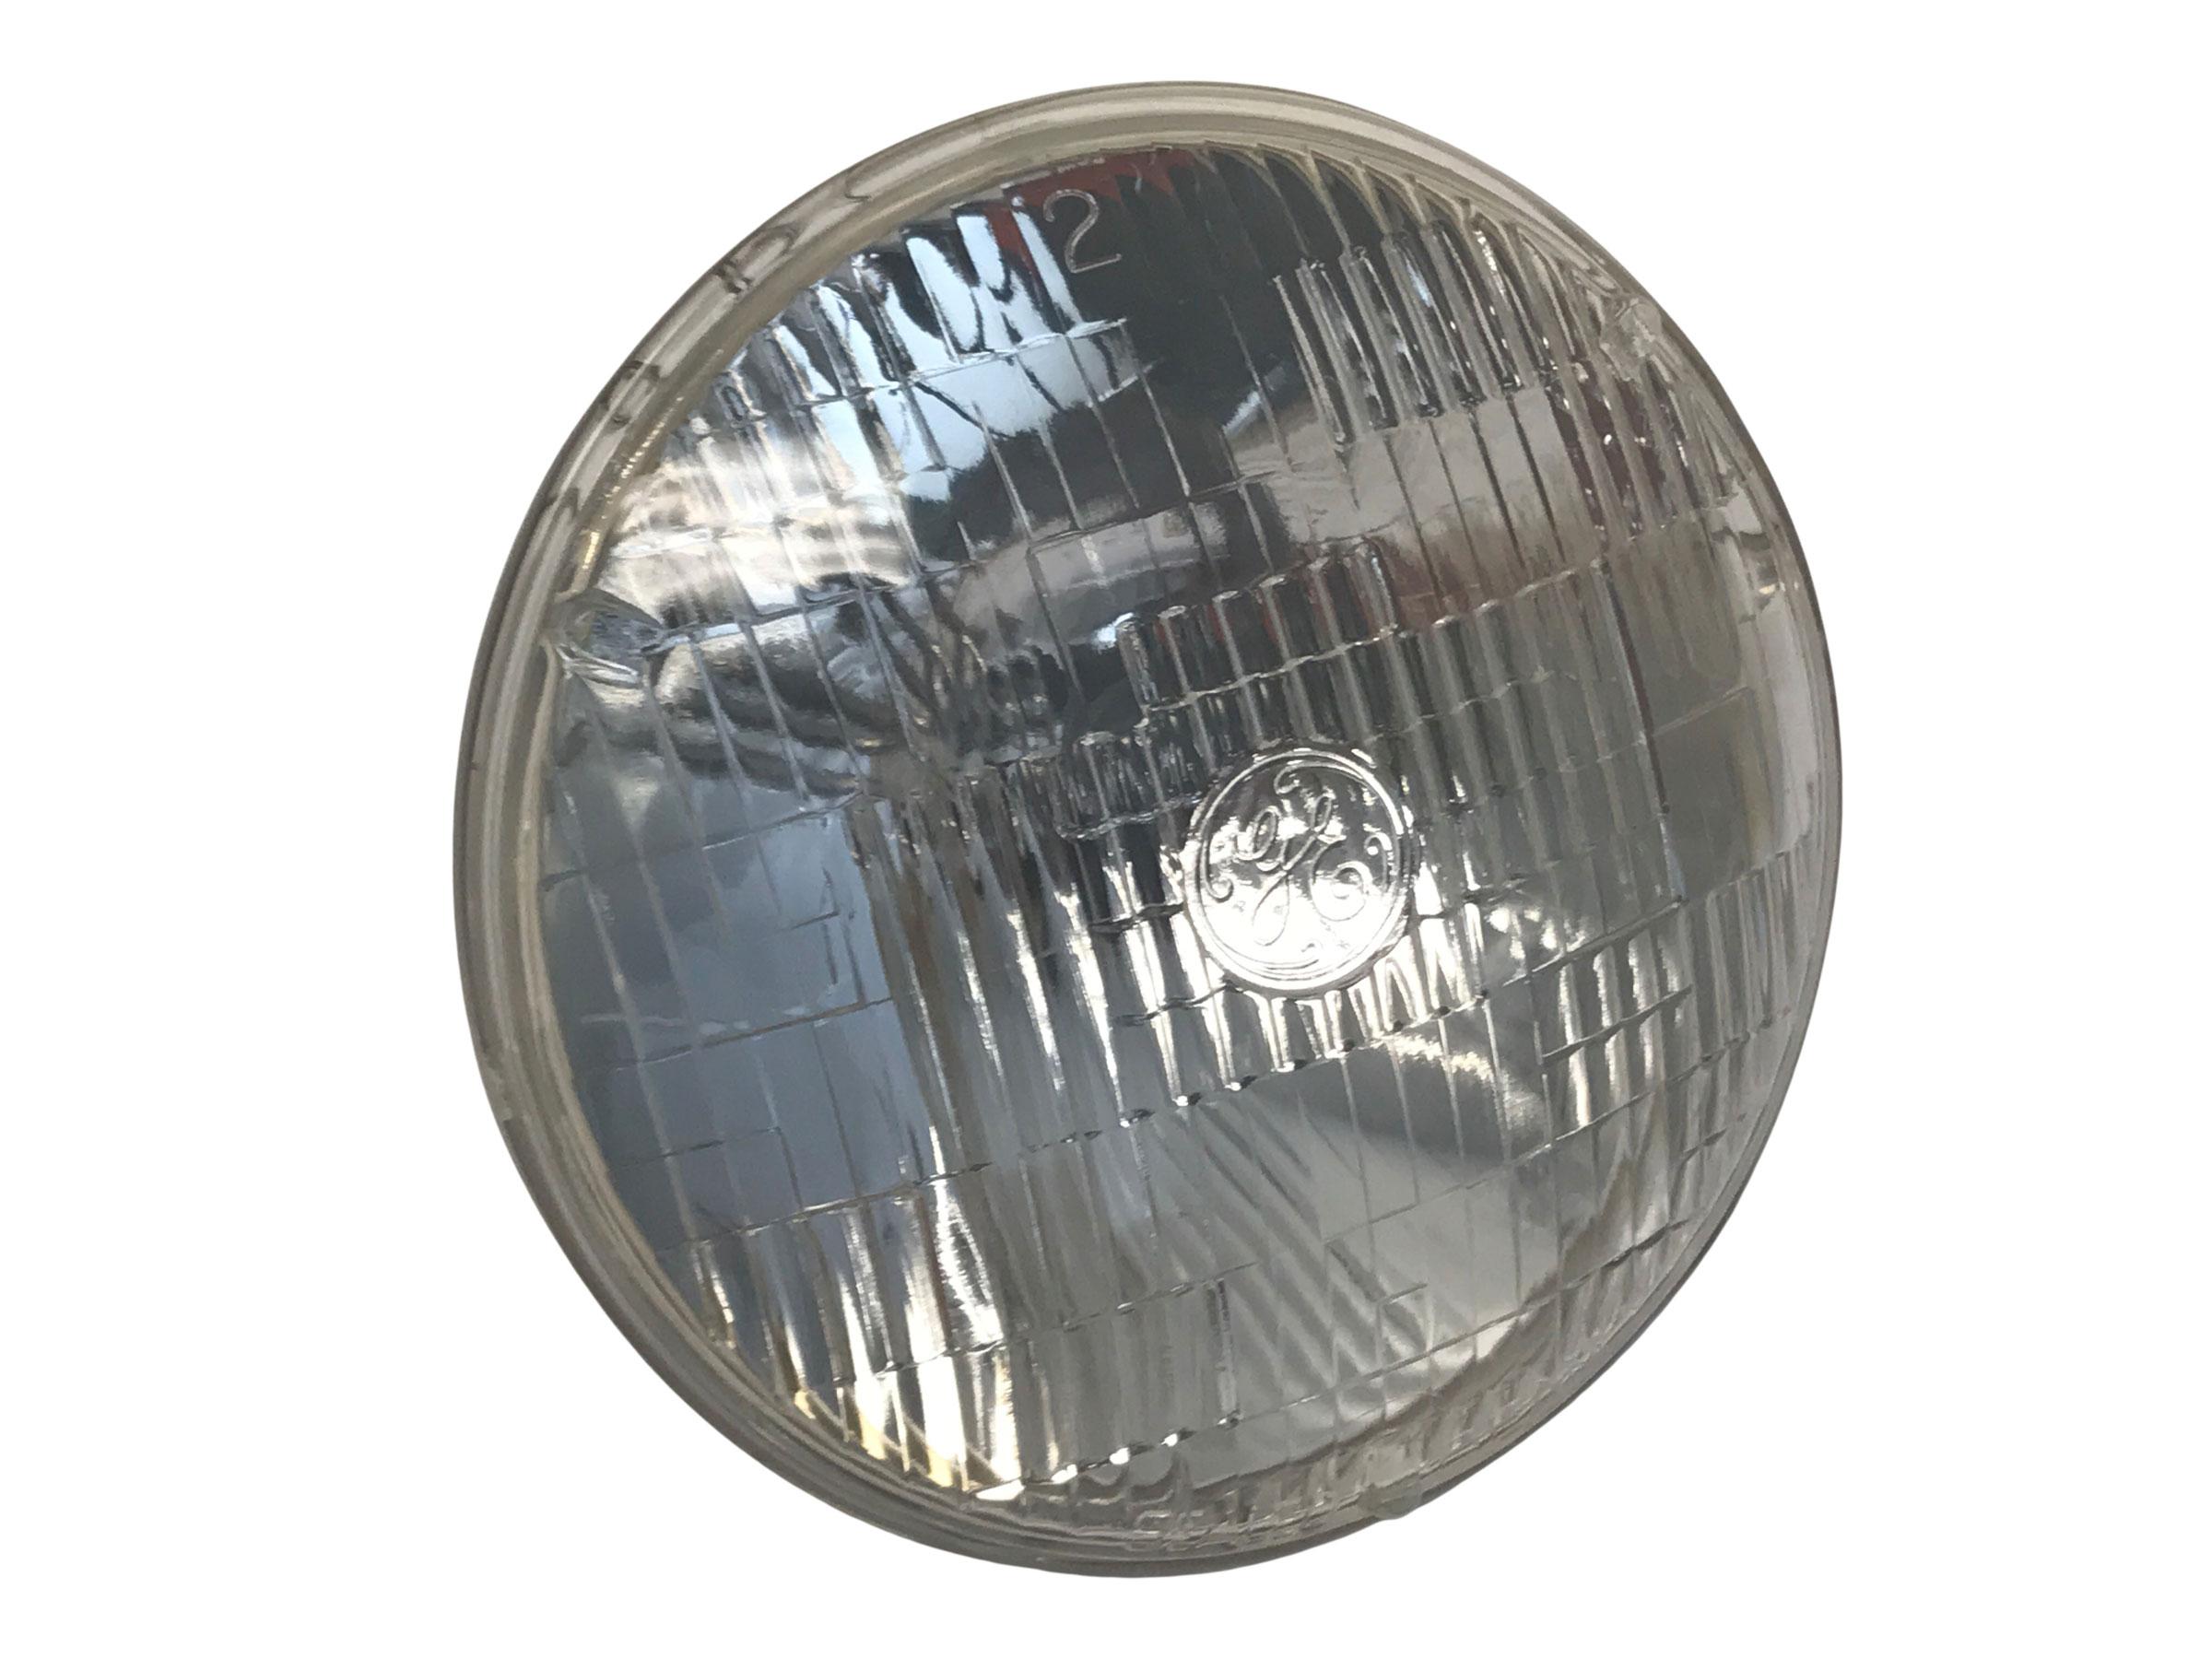 6 volt headlight bristan 1901 shower head